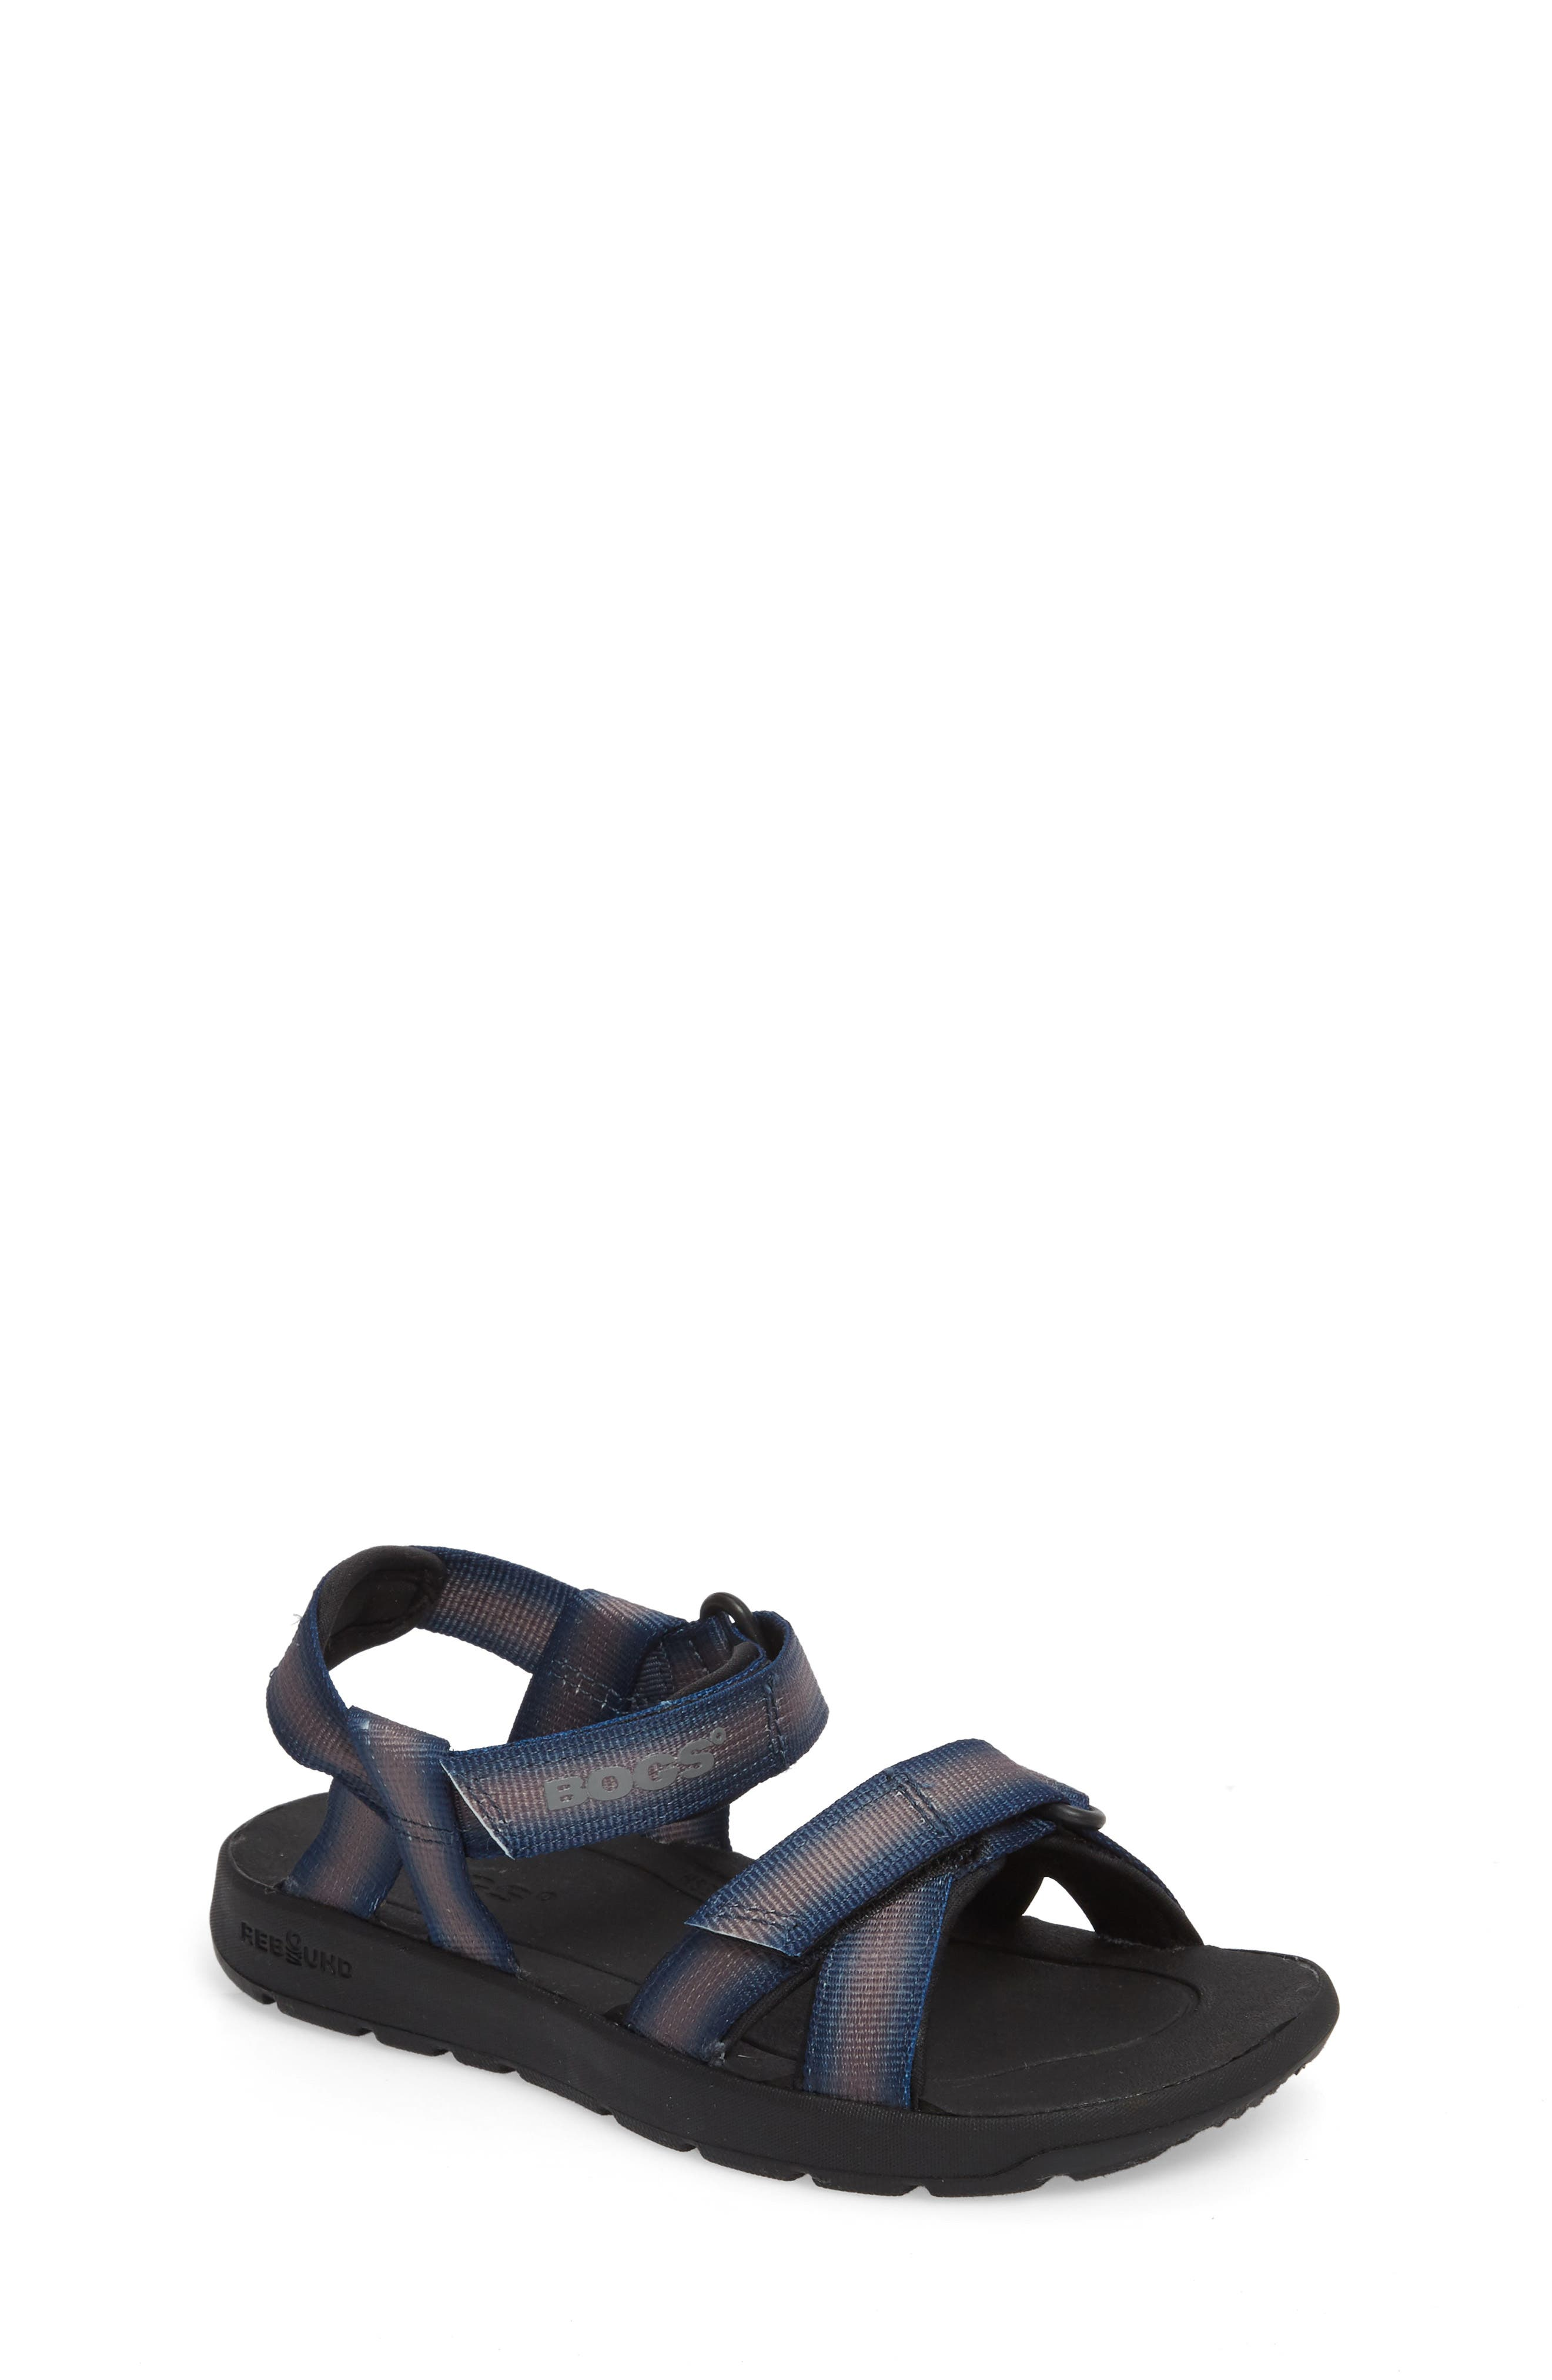 BOGS Rio Sunrise Stripe Sandal, Main, color, 062